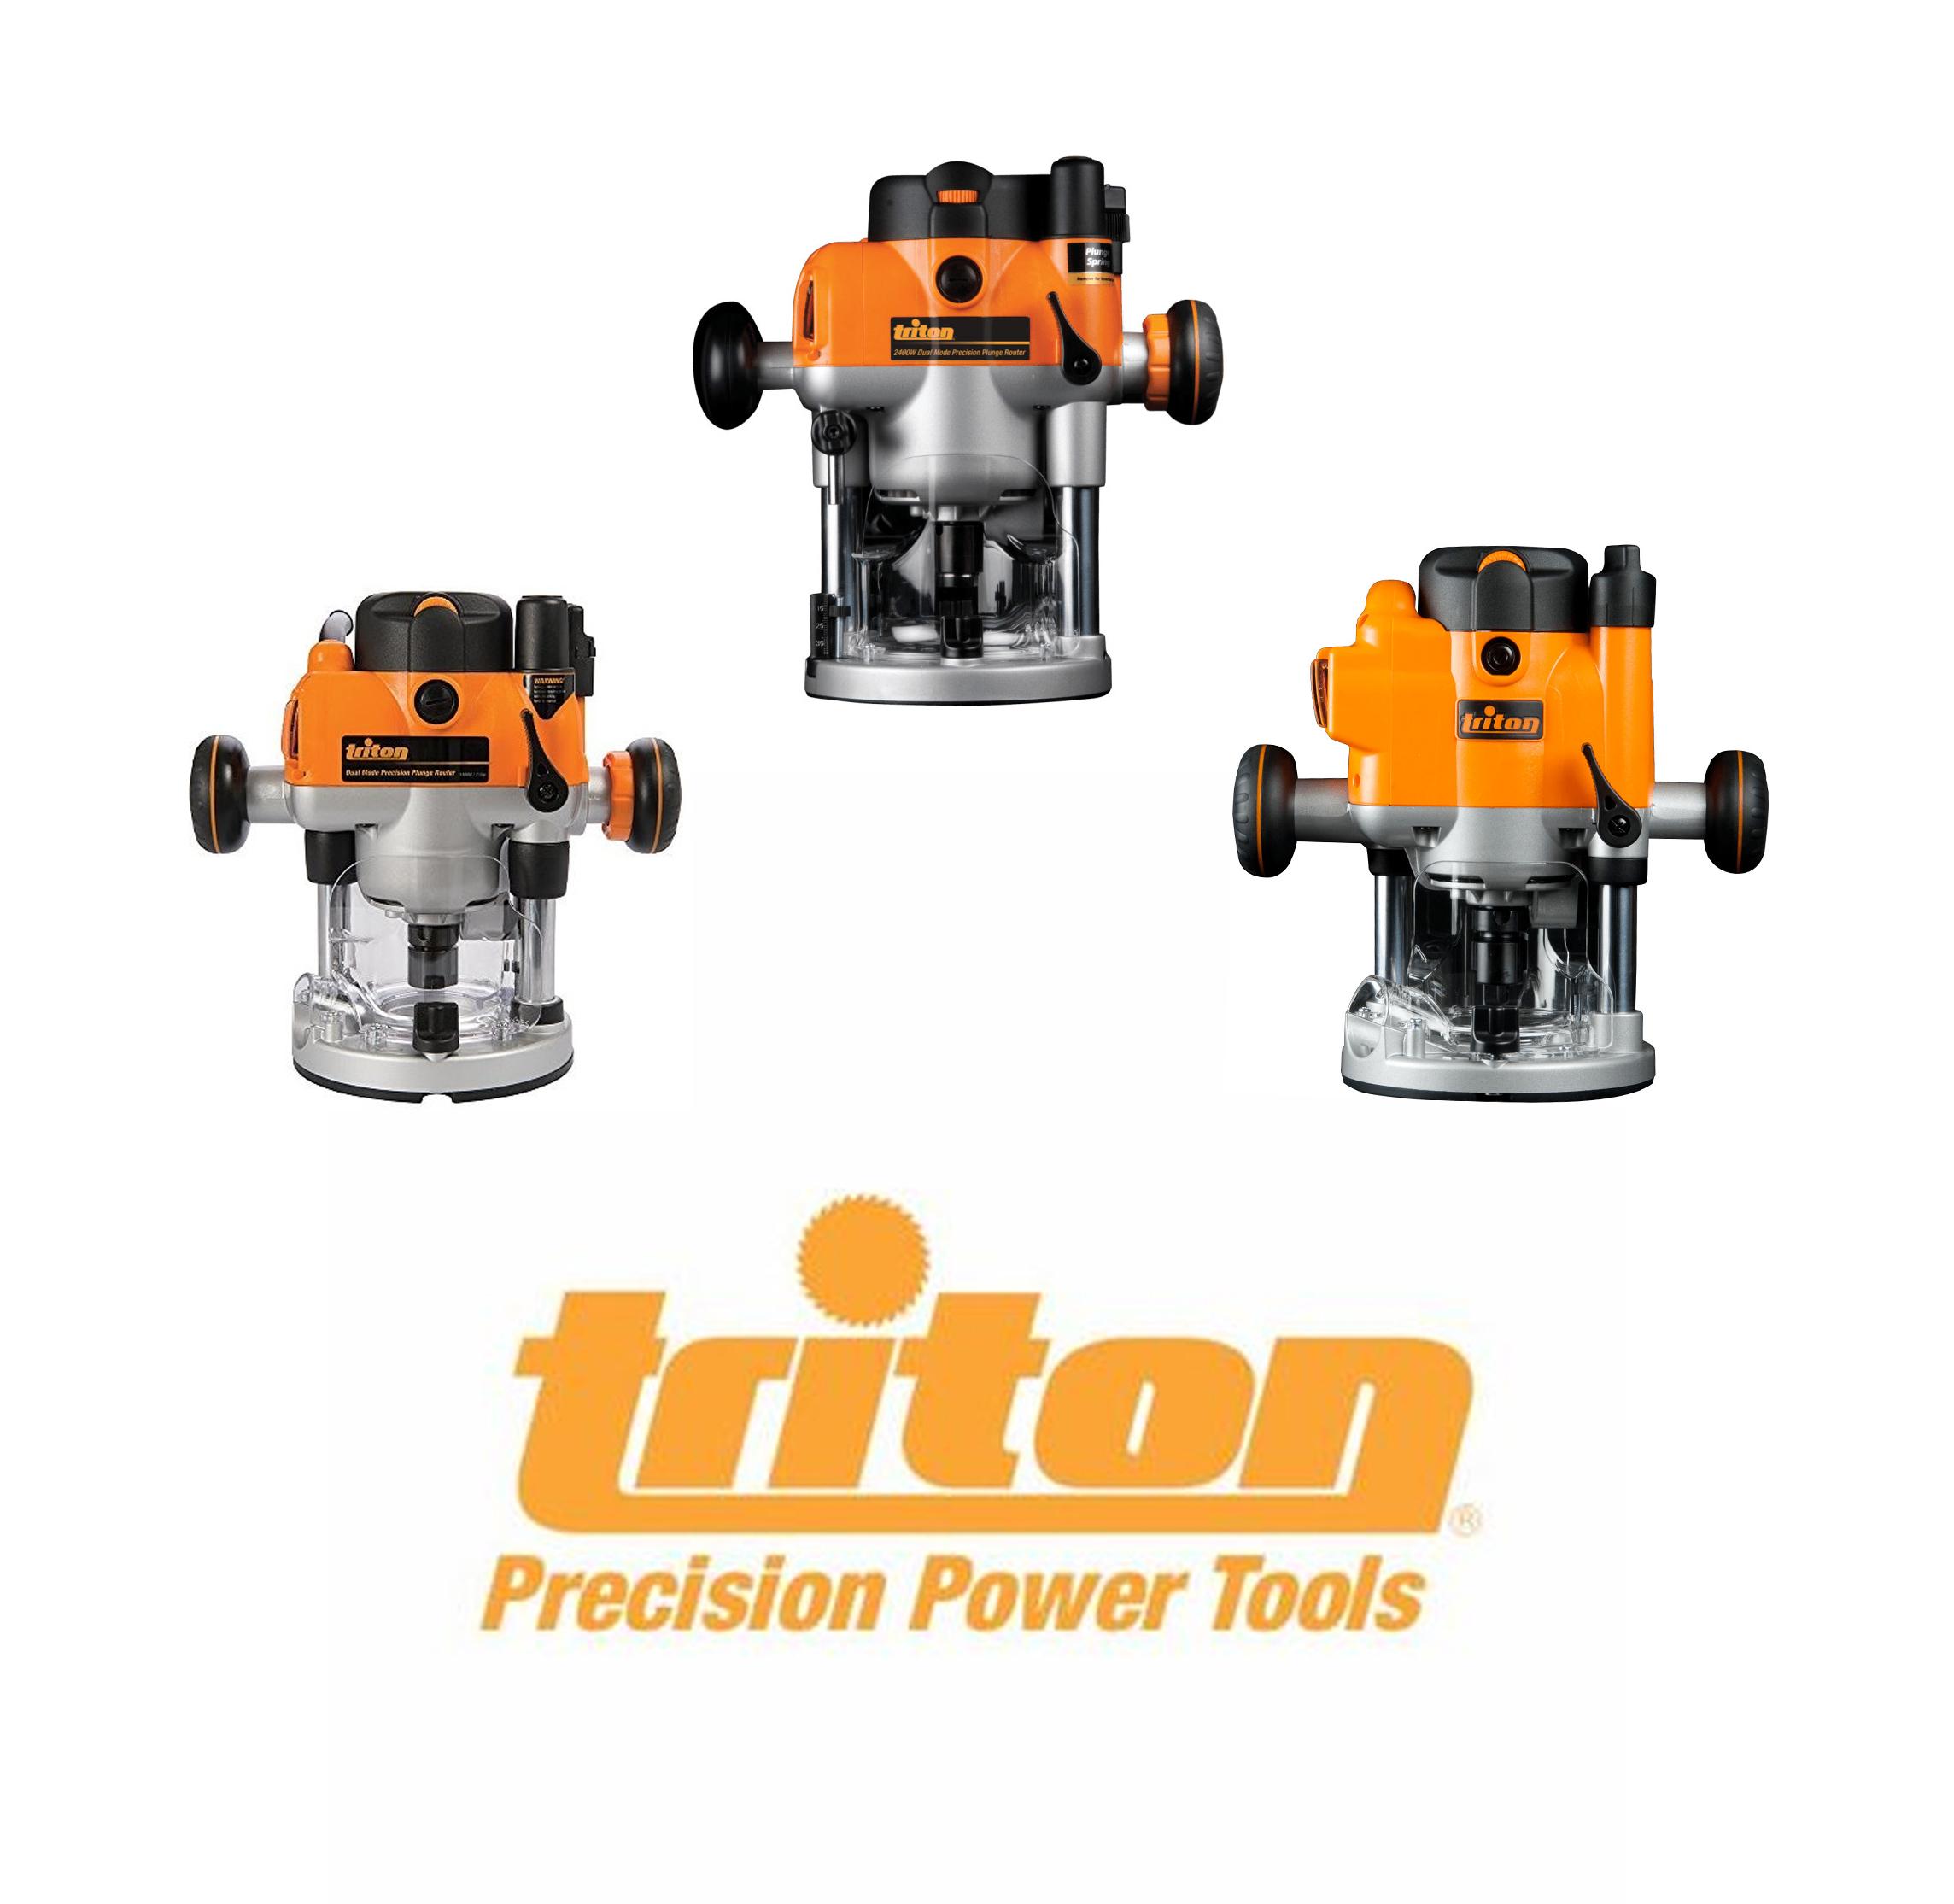 Triton Sammeldeal Oberfräsen TRA001, MOF001, JOF001 / Flachdübelfräse /Elektro-Falzhobel / Kreissägemodul / Spindelschleifer [screwfix]